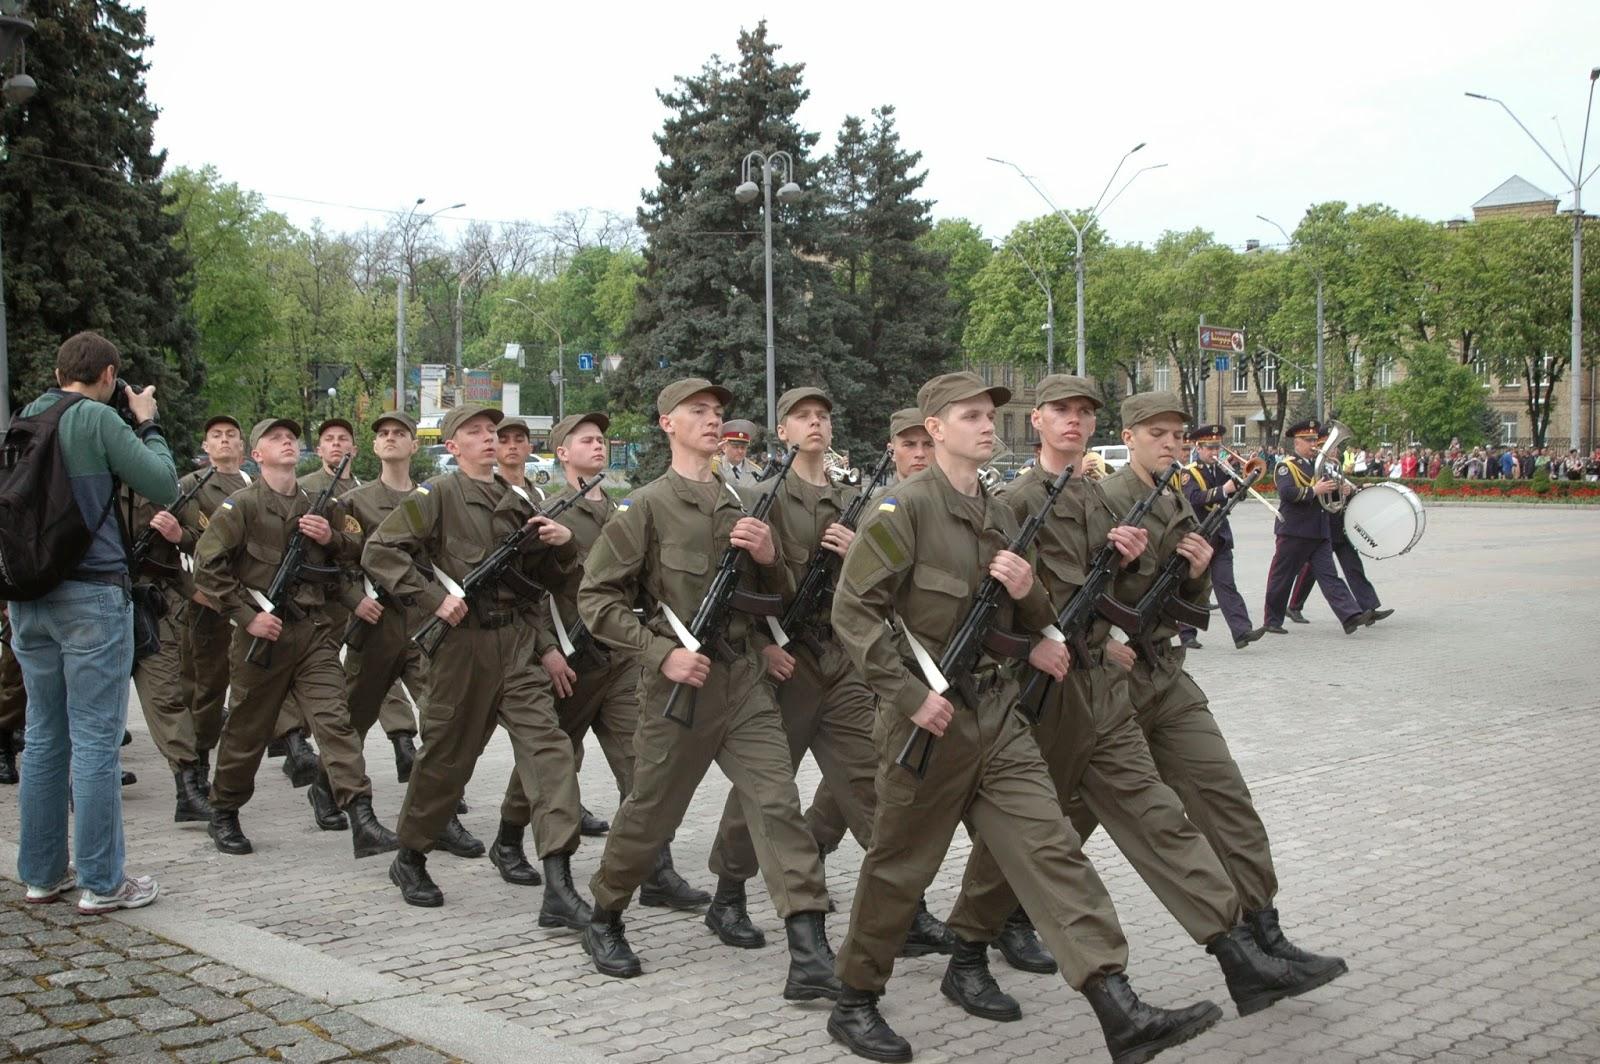 Фото Виталия Бабенко: нацгвардейцы маршируют